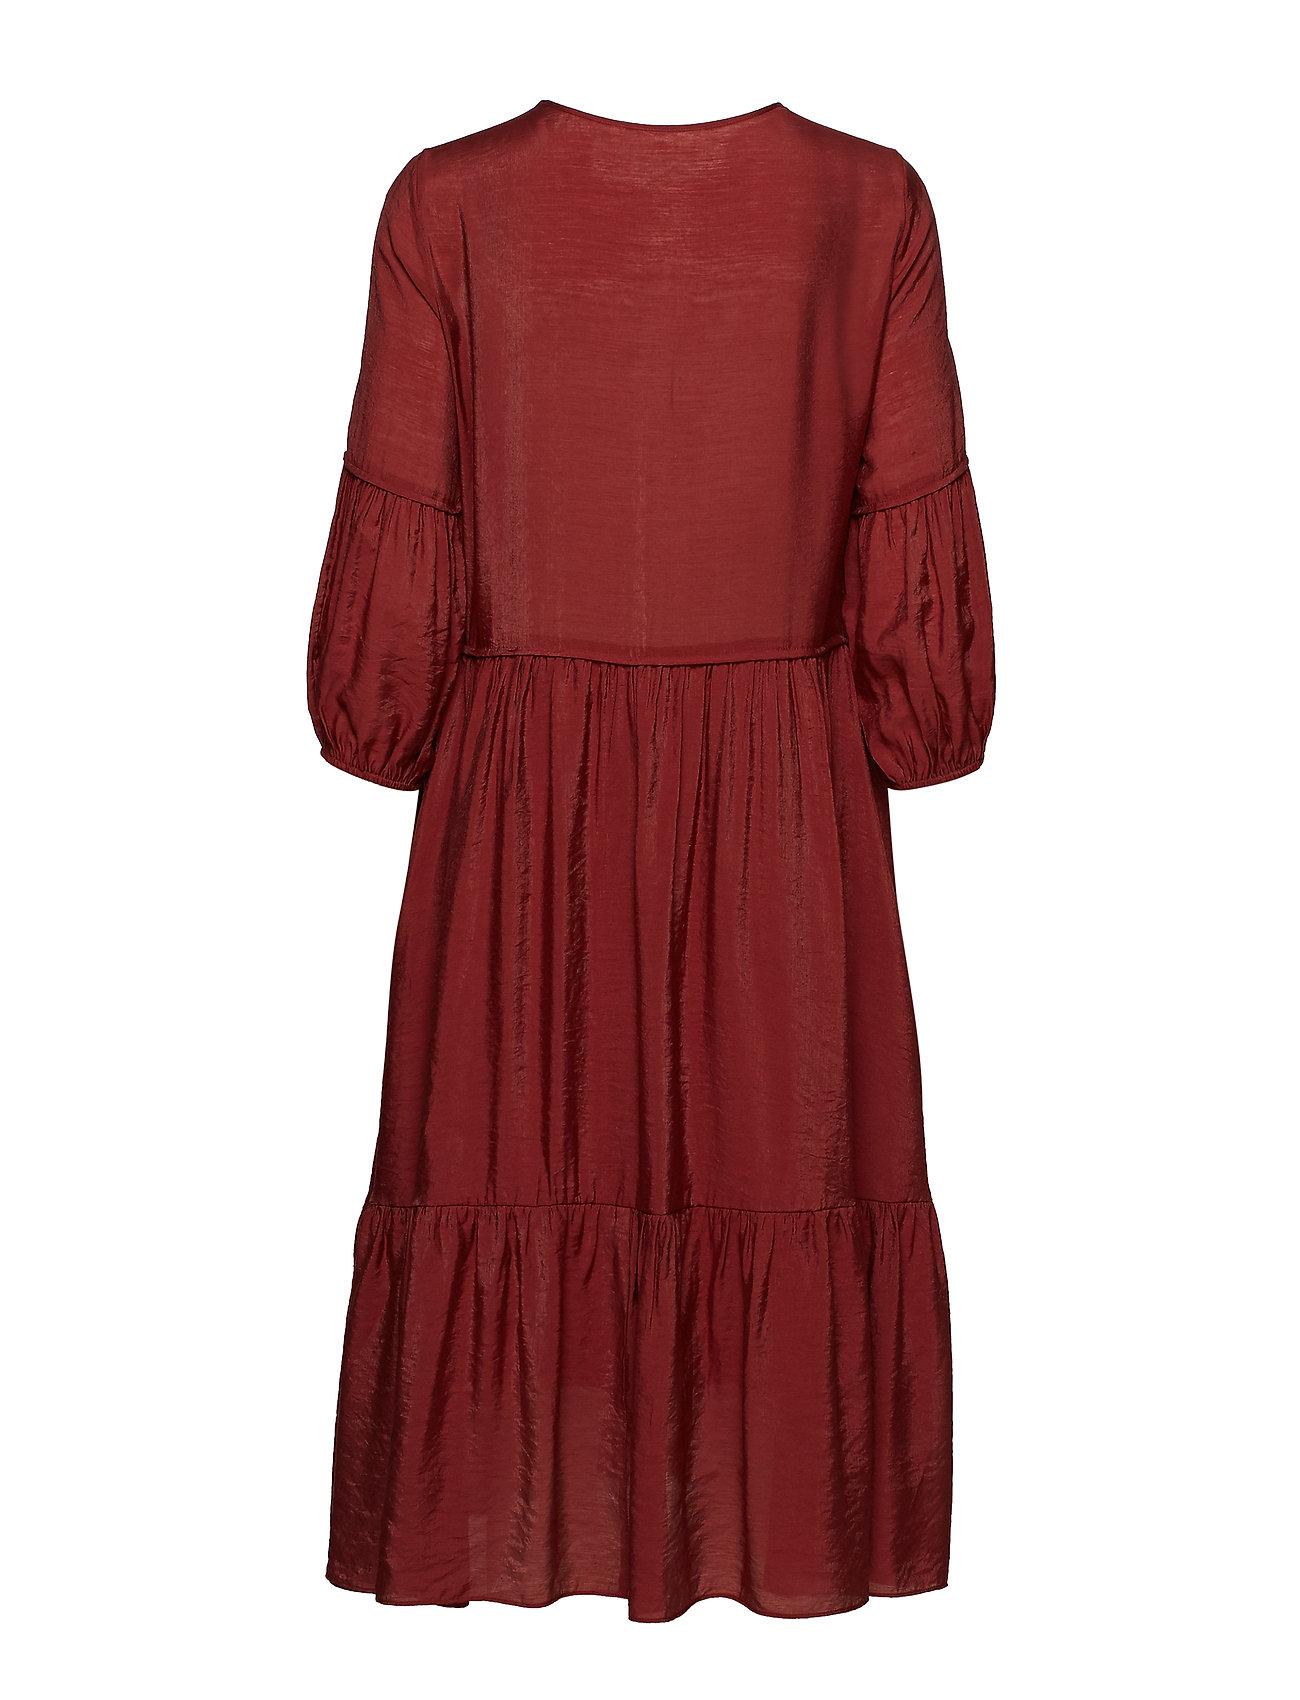 Scotia Dress (Russet Brown) (750 kr) - InWear